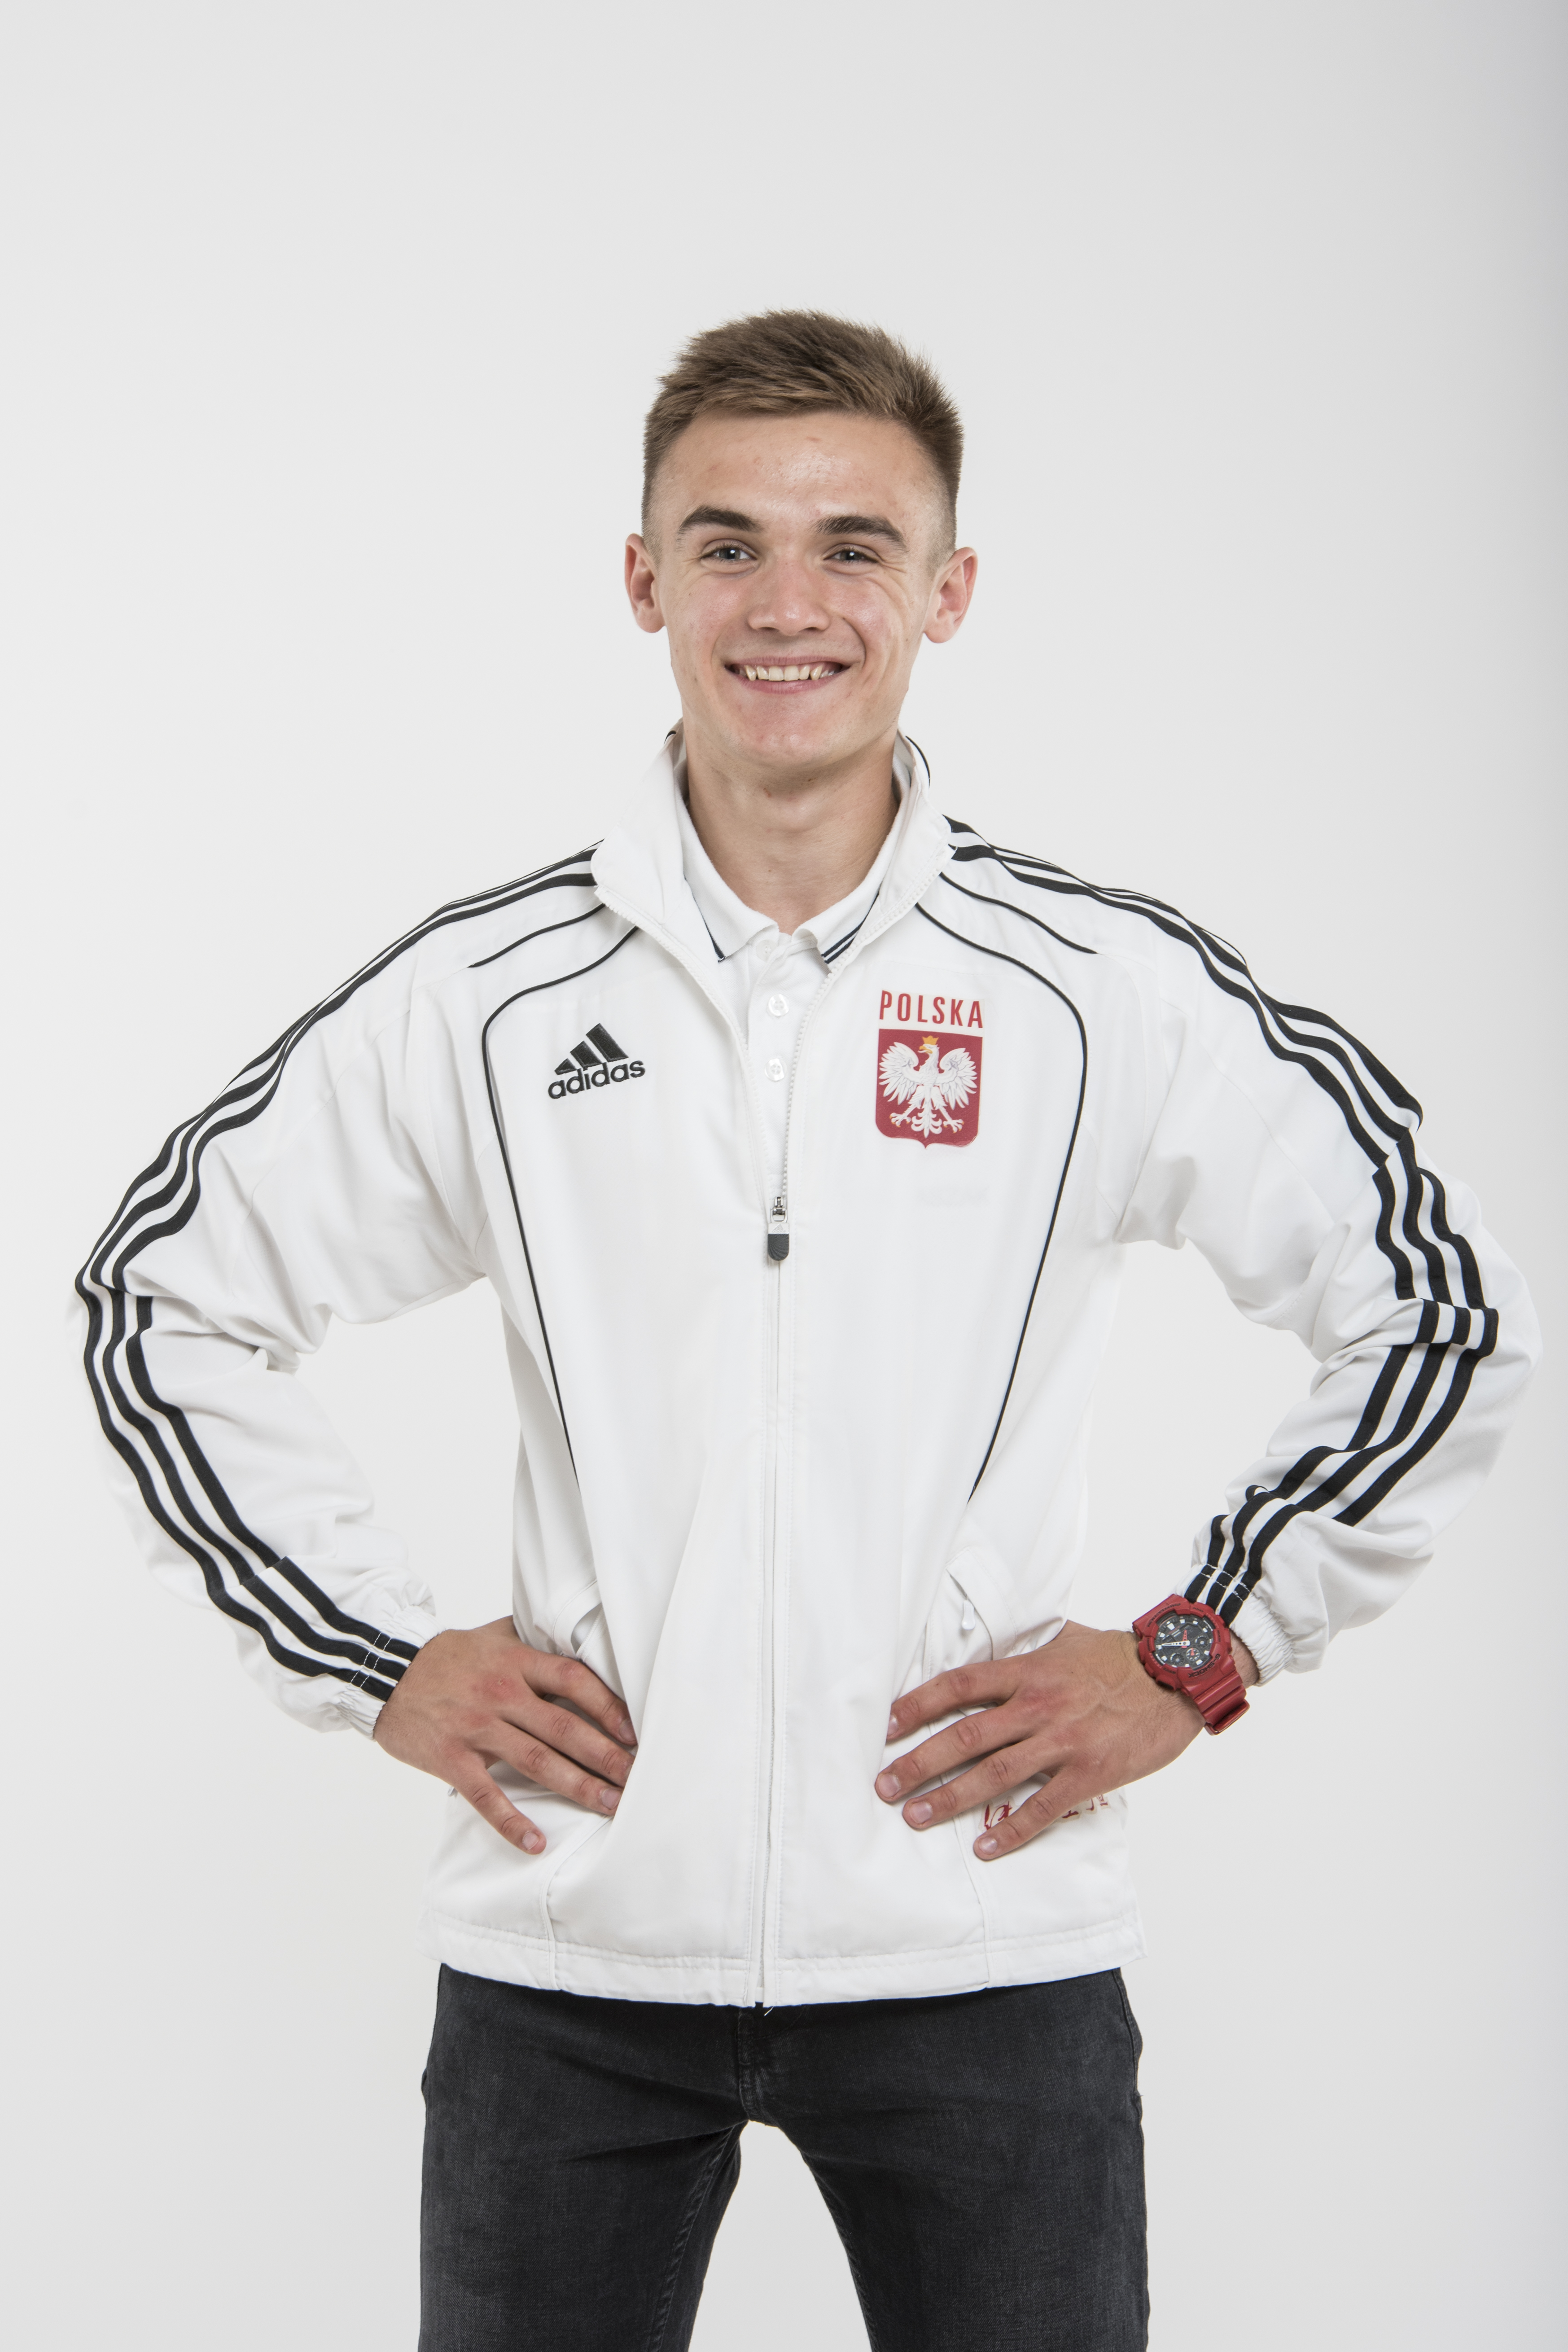 Wiktor Staszak